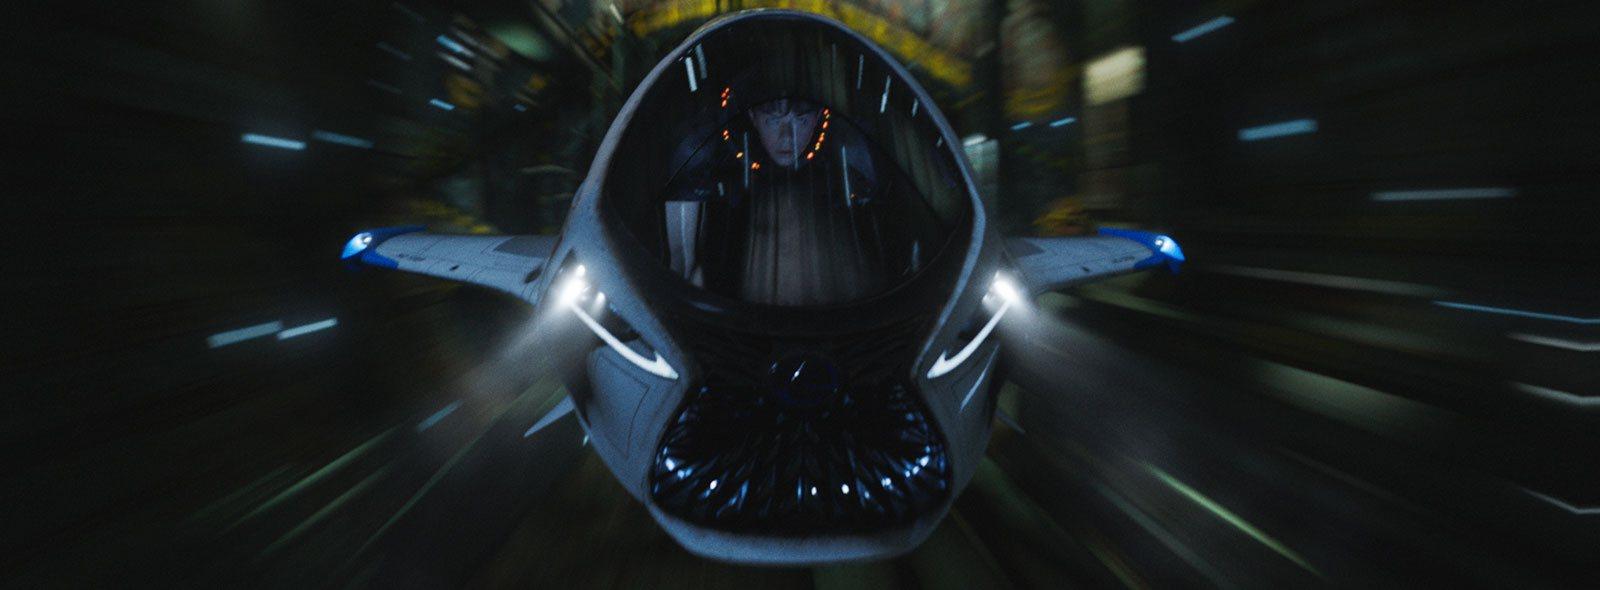 Vista frontal de la nave Skyjet pilotada por Valerian